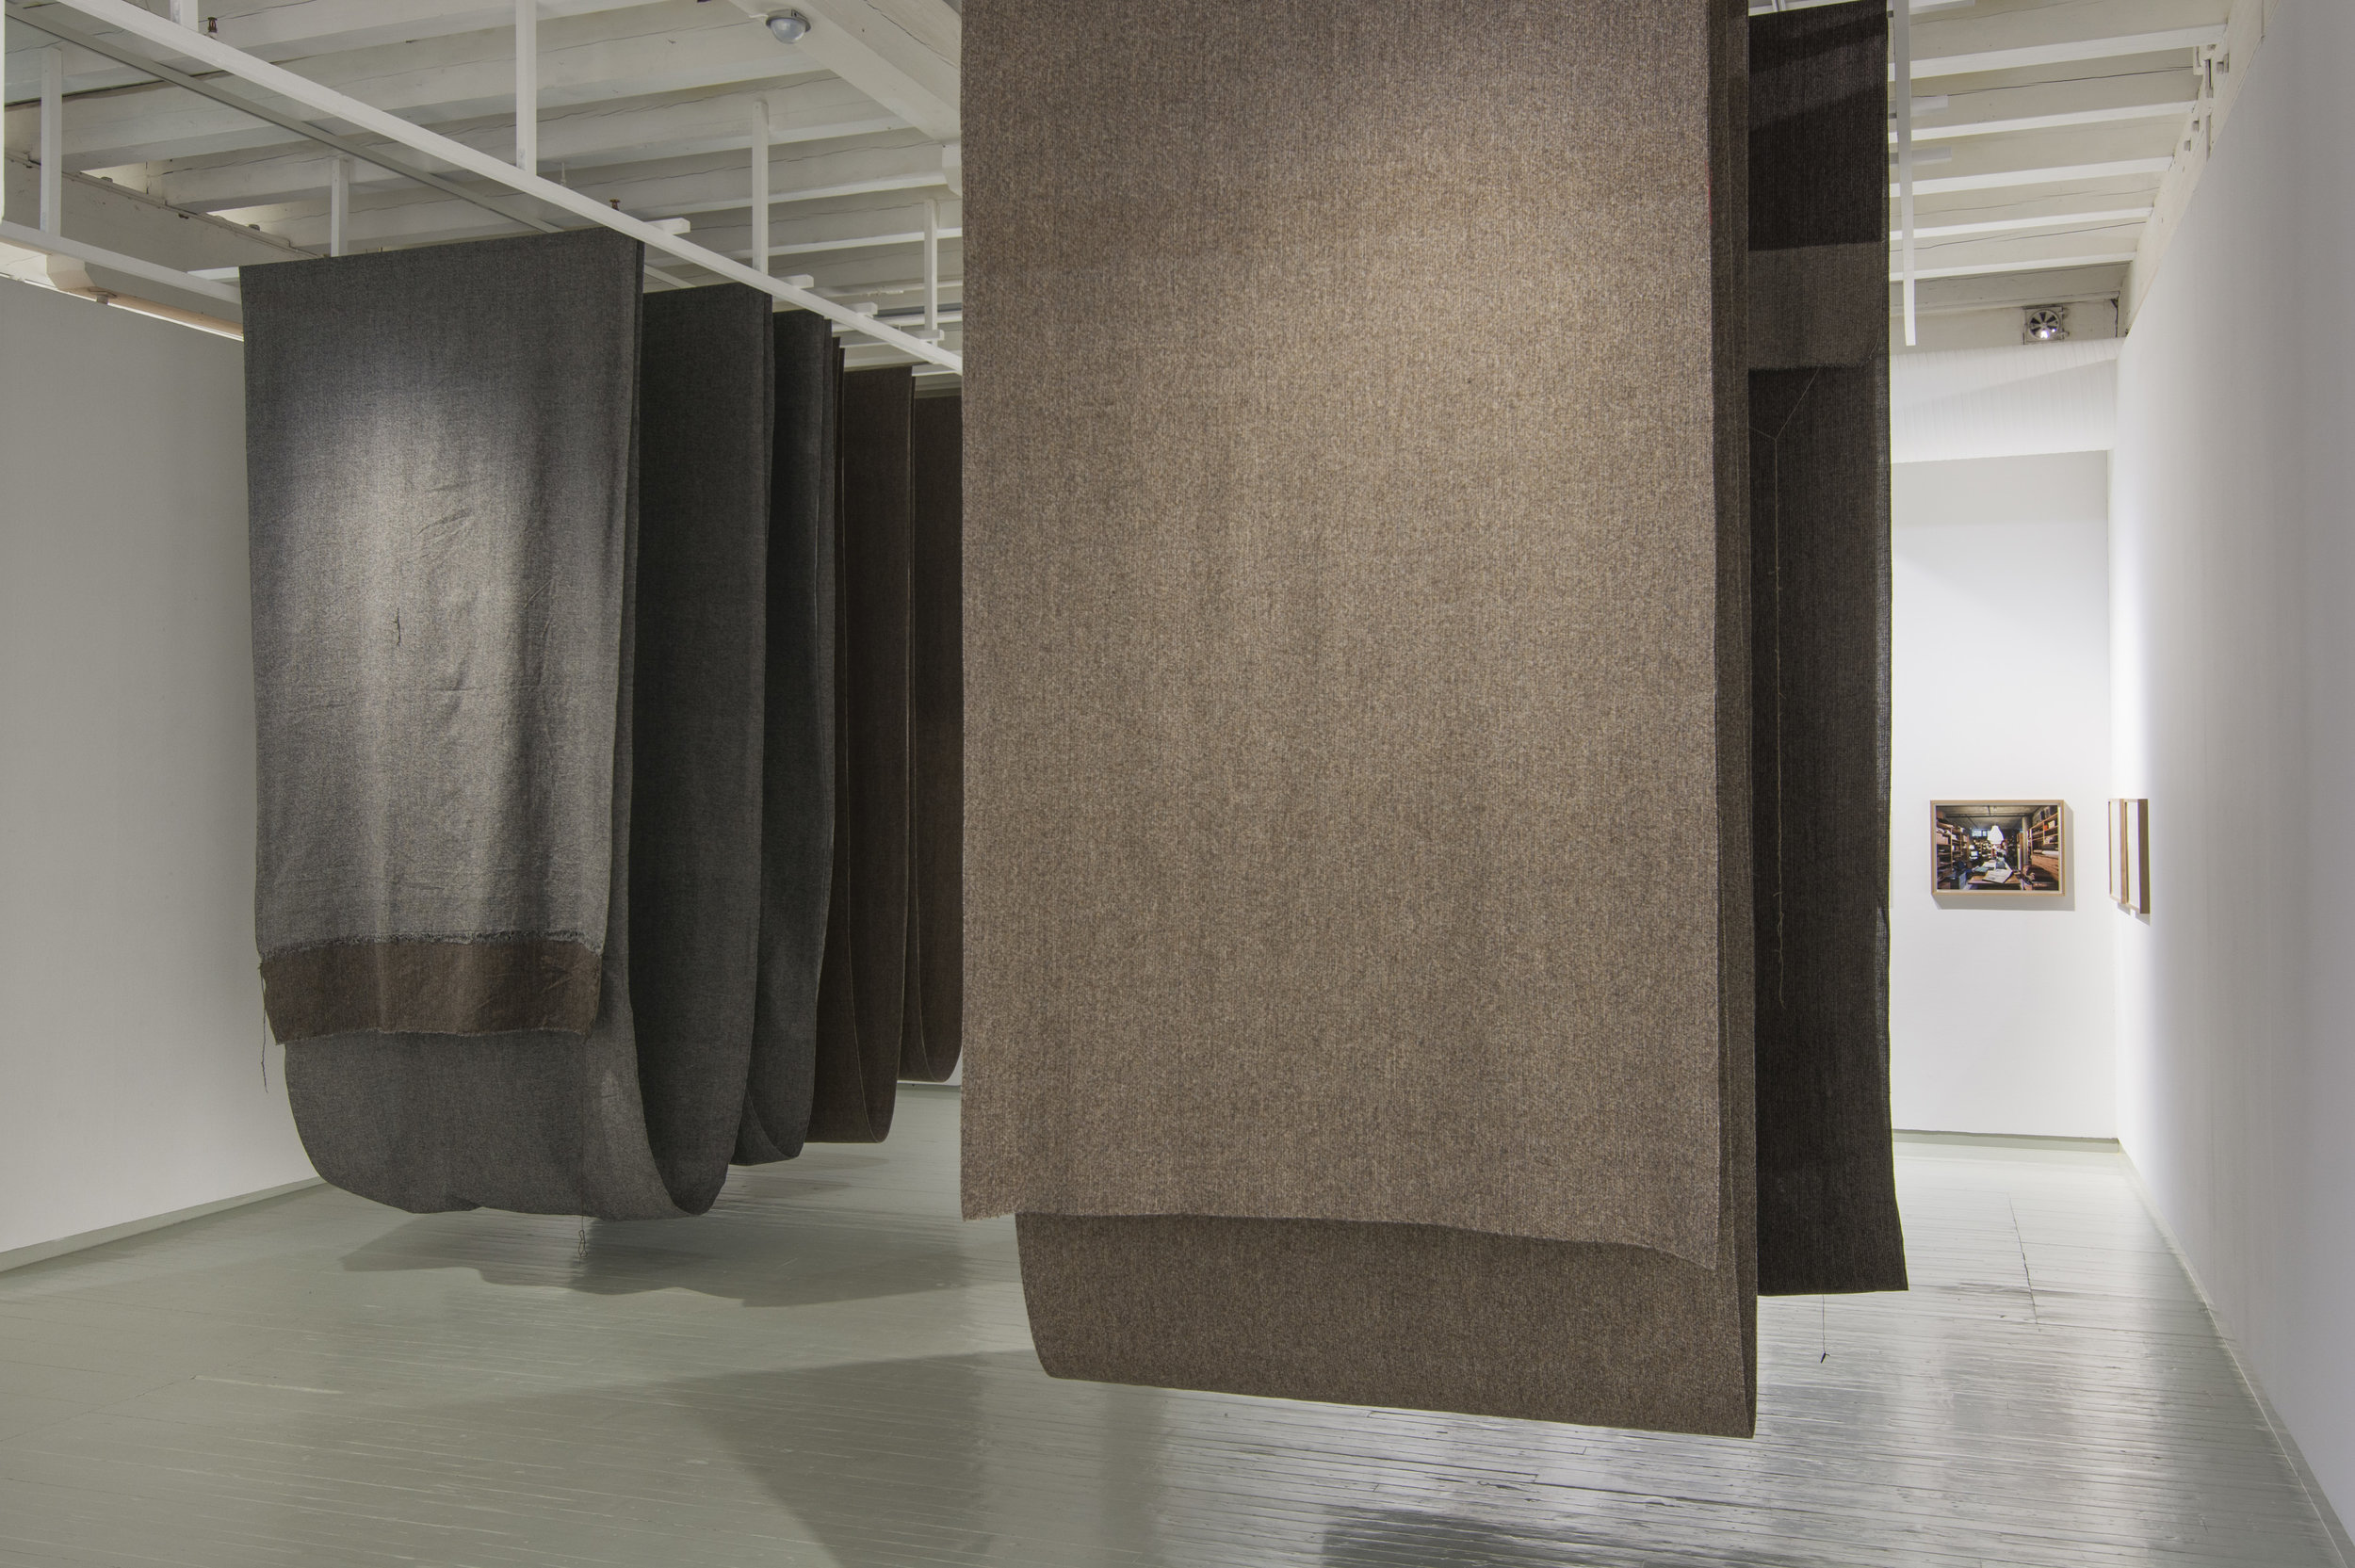 Franz Schmidts arbeider i utstillingen Aktiv Materie. Foto: Harald Solberg